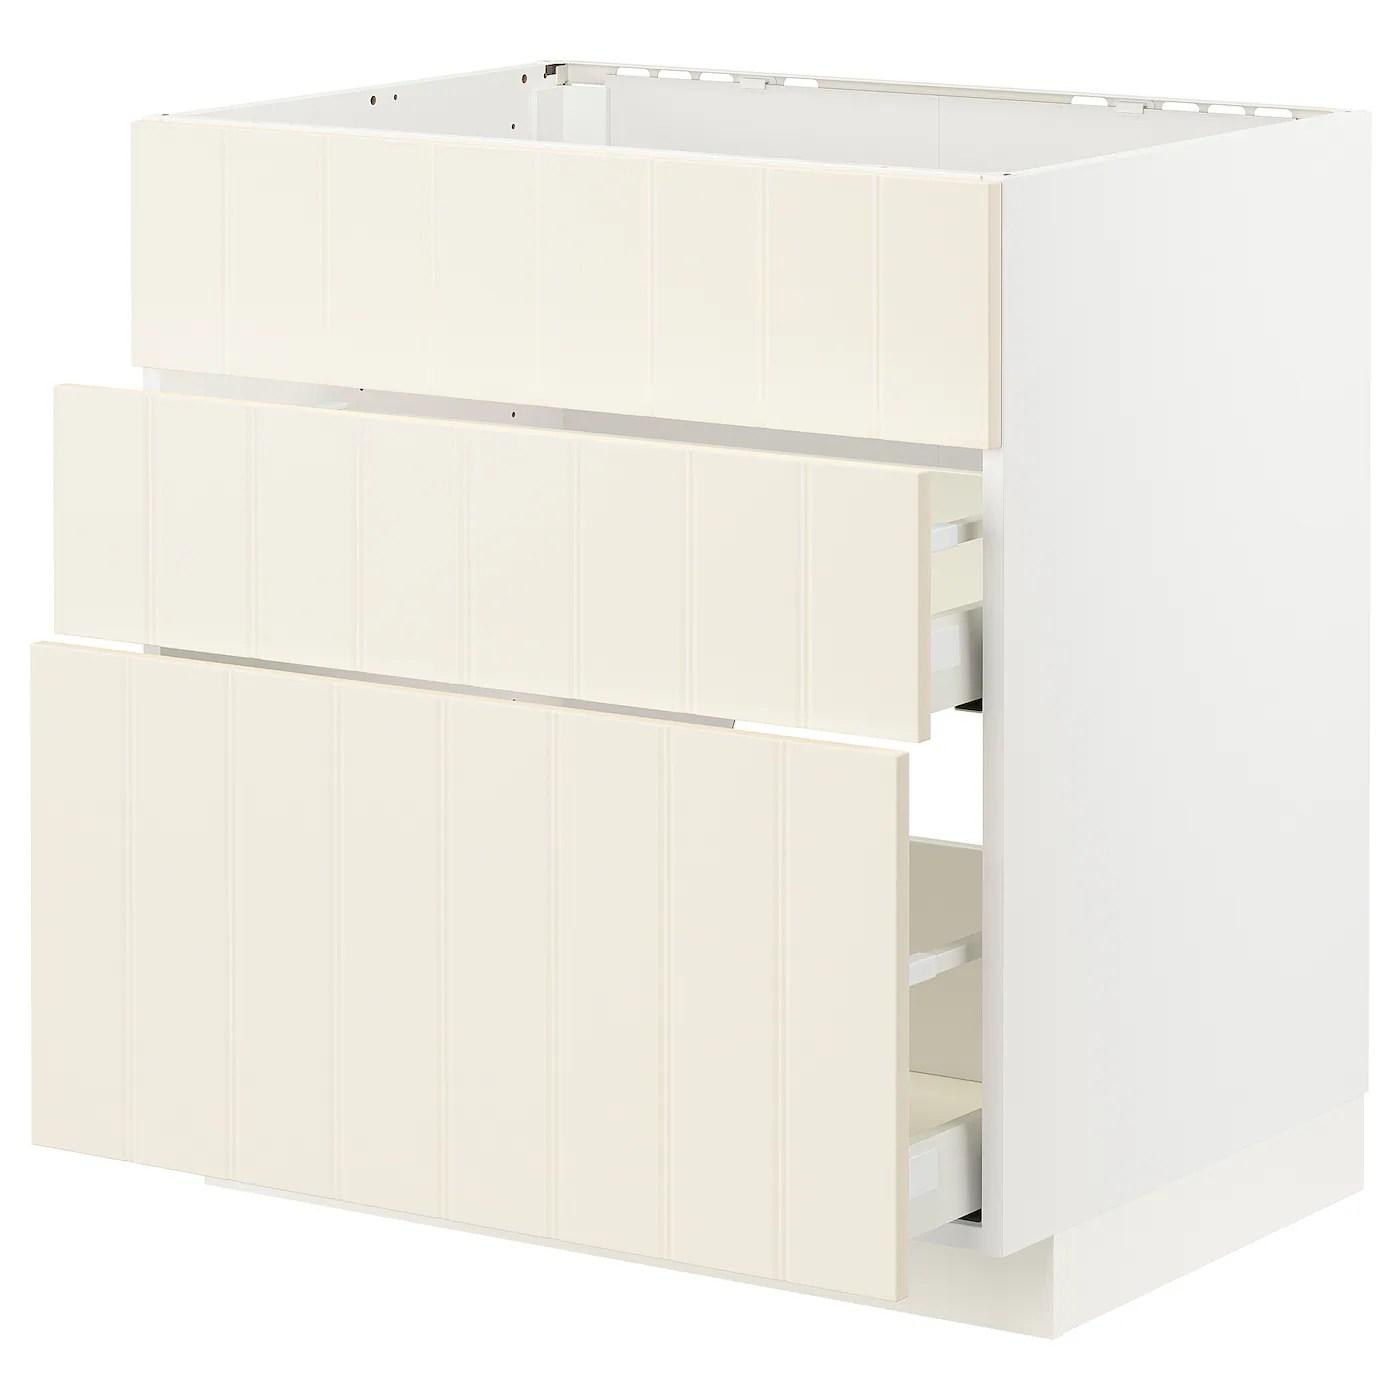 Ikea Küche Unterschrank Korpus | Wohnwand Colourart (4 ...